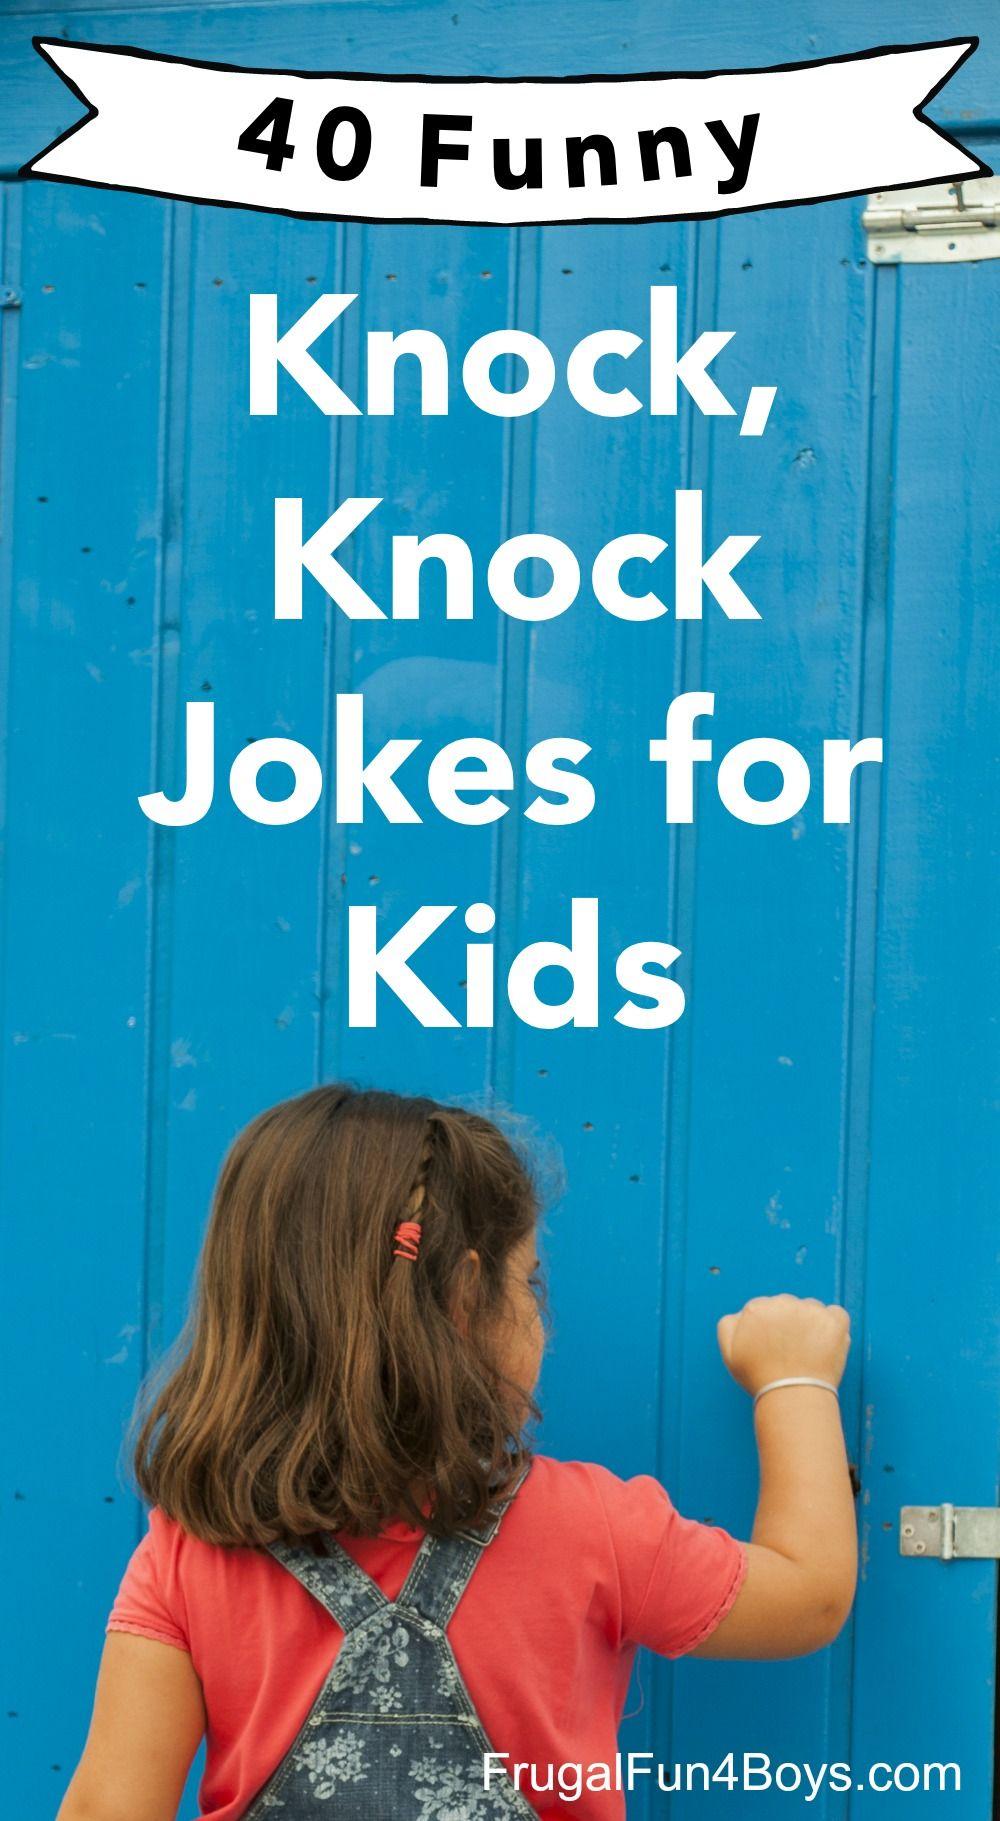 40 Hilarious Knock Knock Jokes For Kids Frugal Fun For Boys And Girls Funny Jokes For Kids Jokes For Kids Funny Knock Knock Jokes